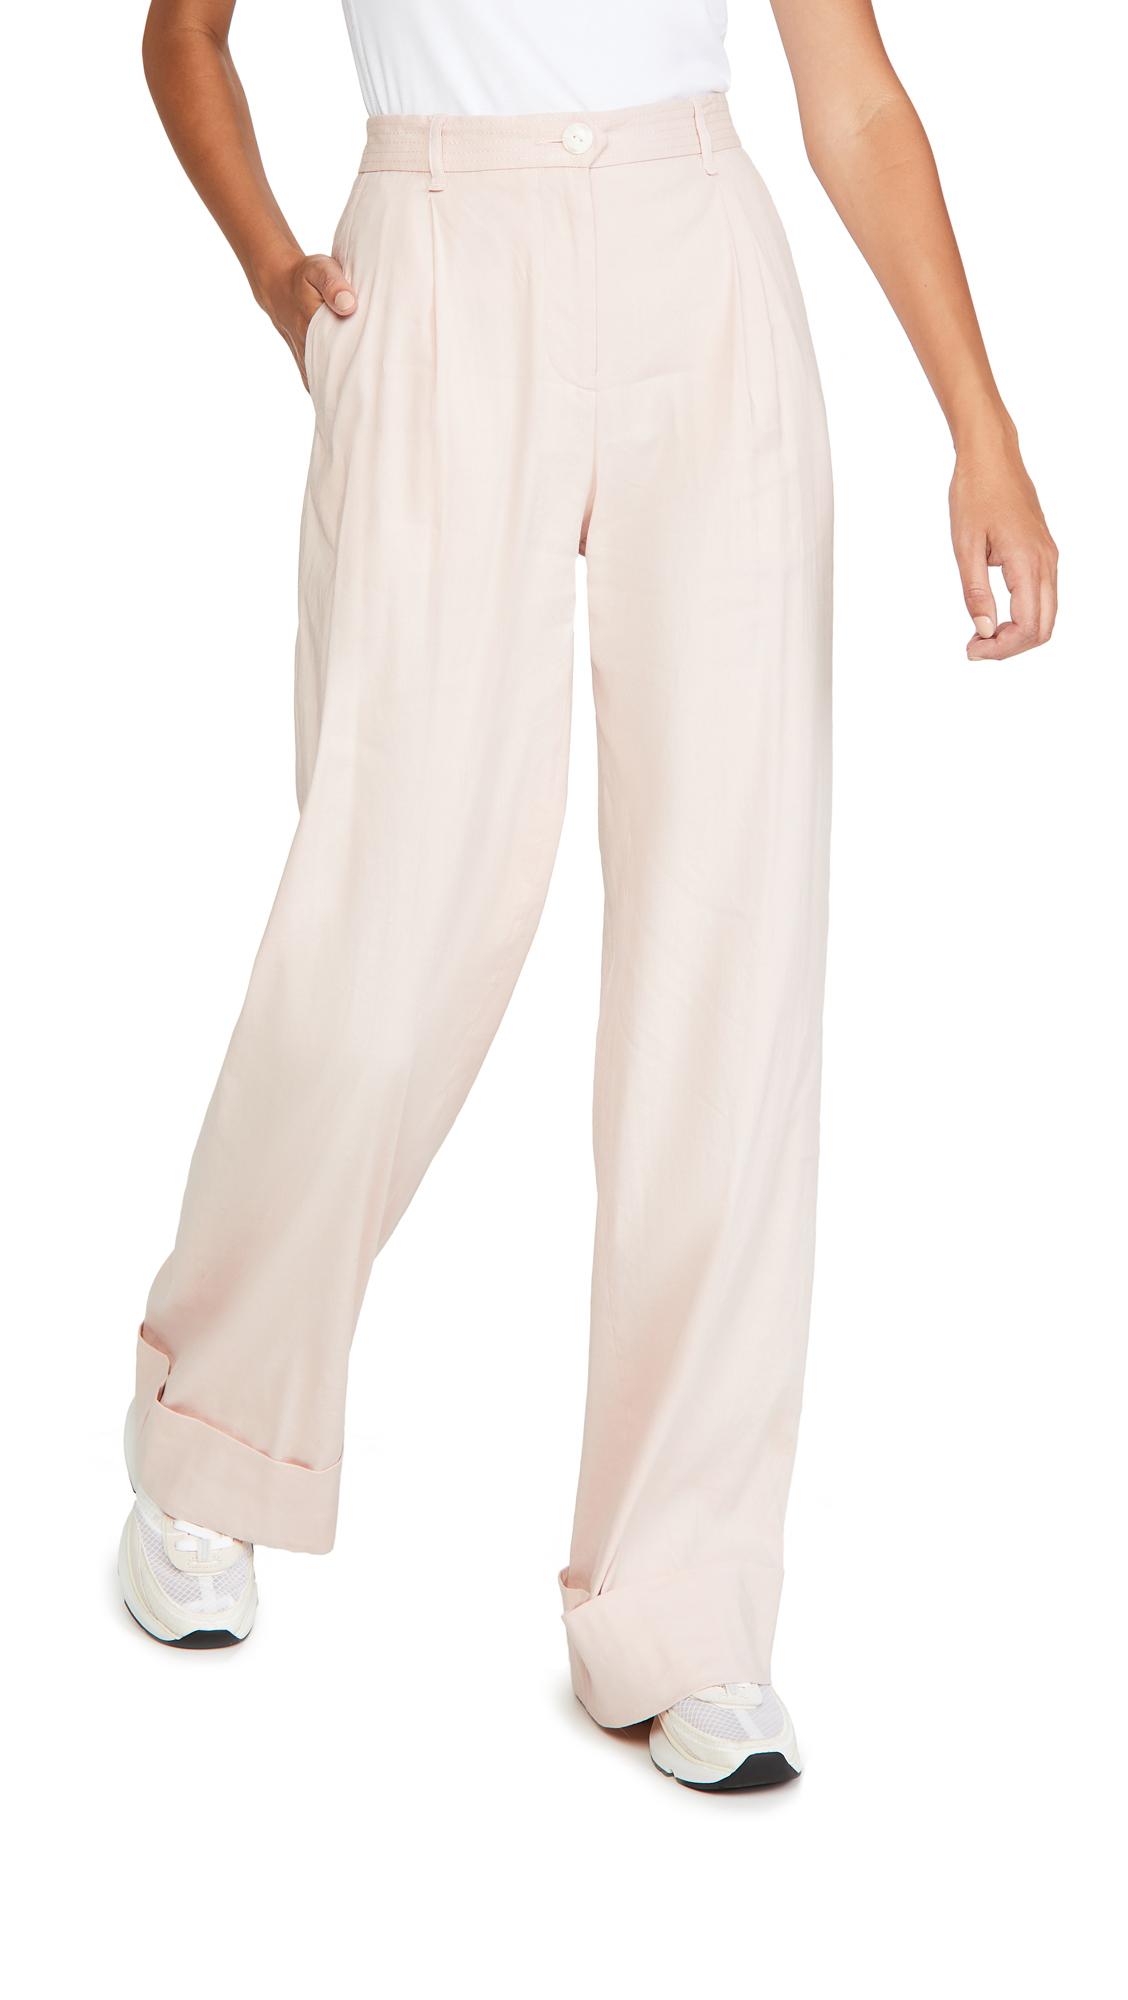 Rag & Bone Ivy Linen Pants